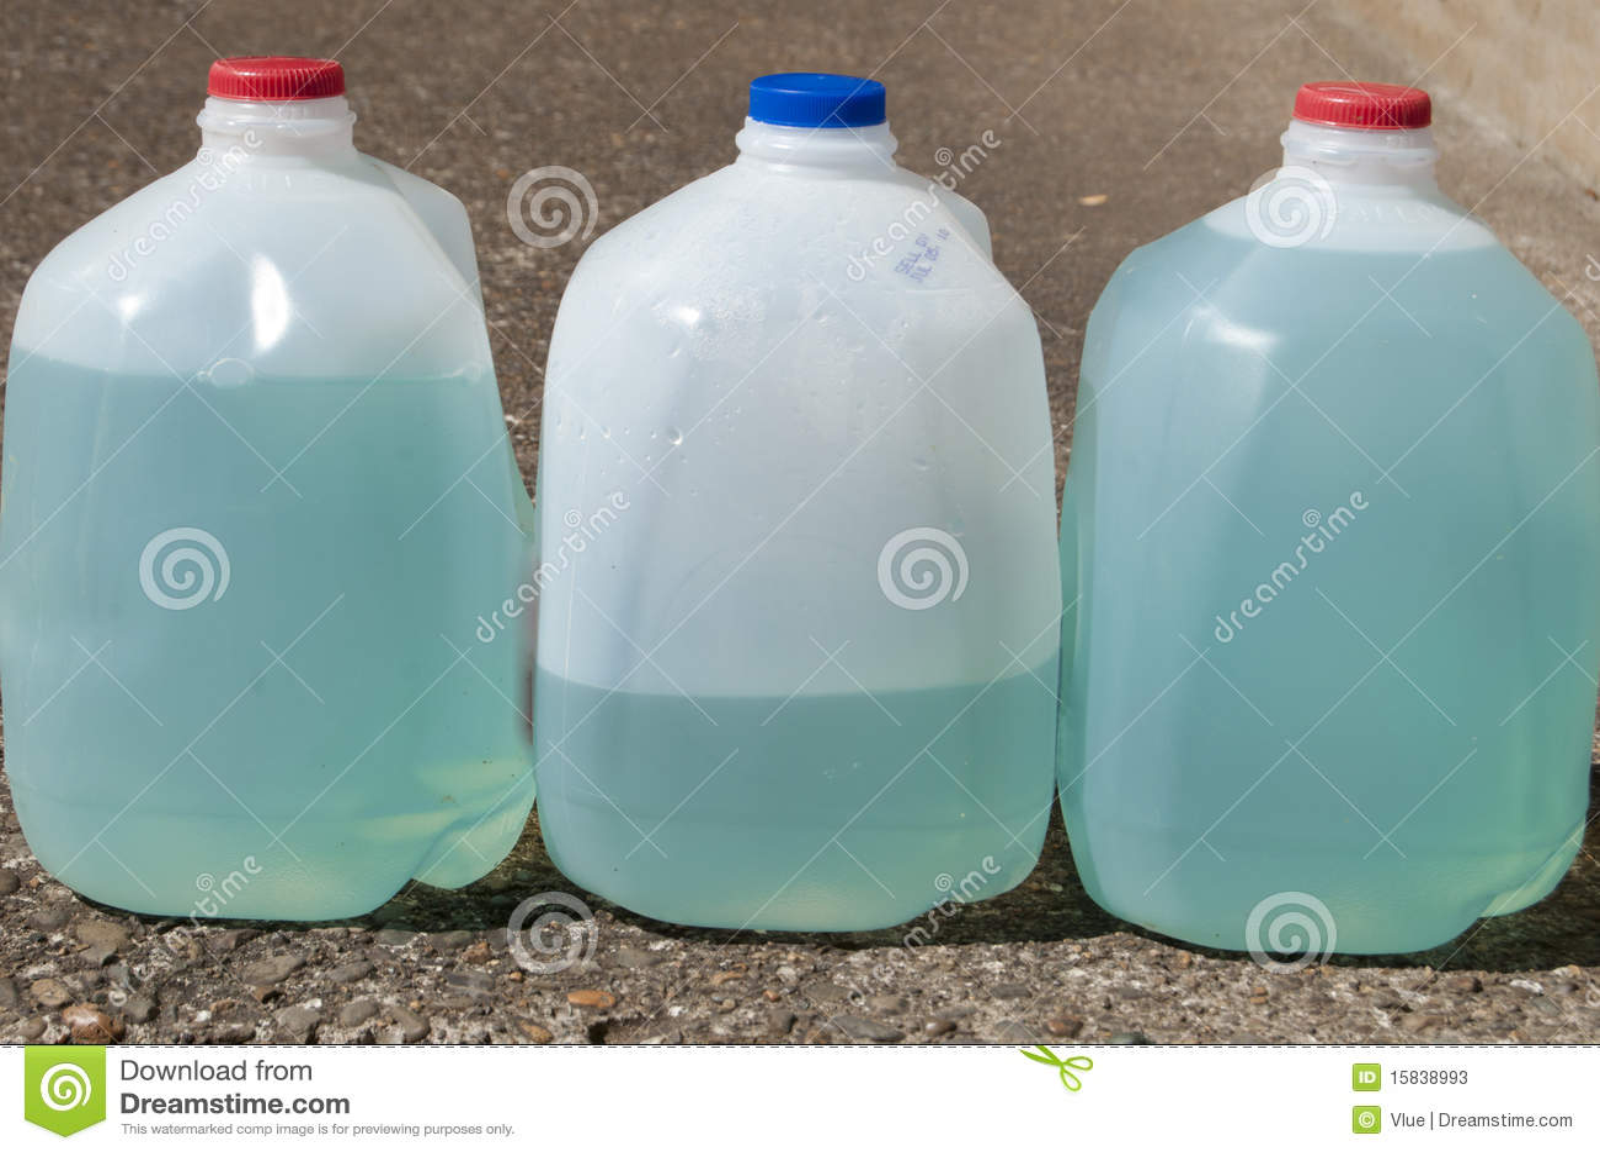 Blue Plant Fertilizer Liquid Stock Image - Image of gallon, water